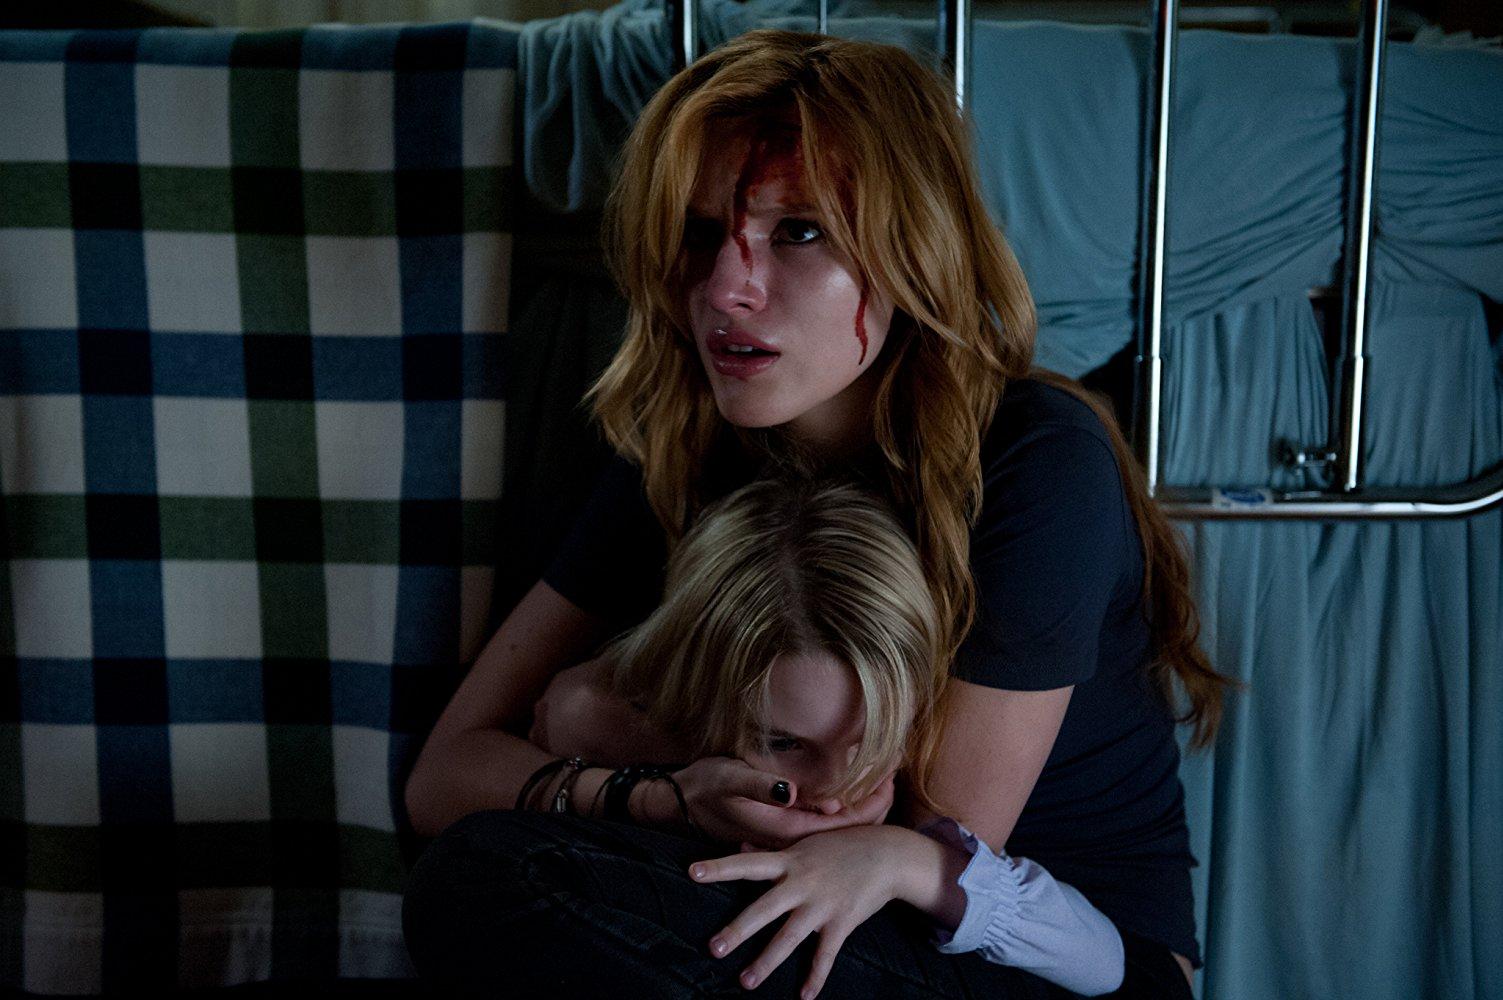 'Amityville: The Awakening' is an unmitigated disaster